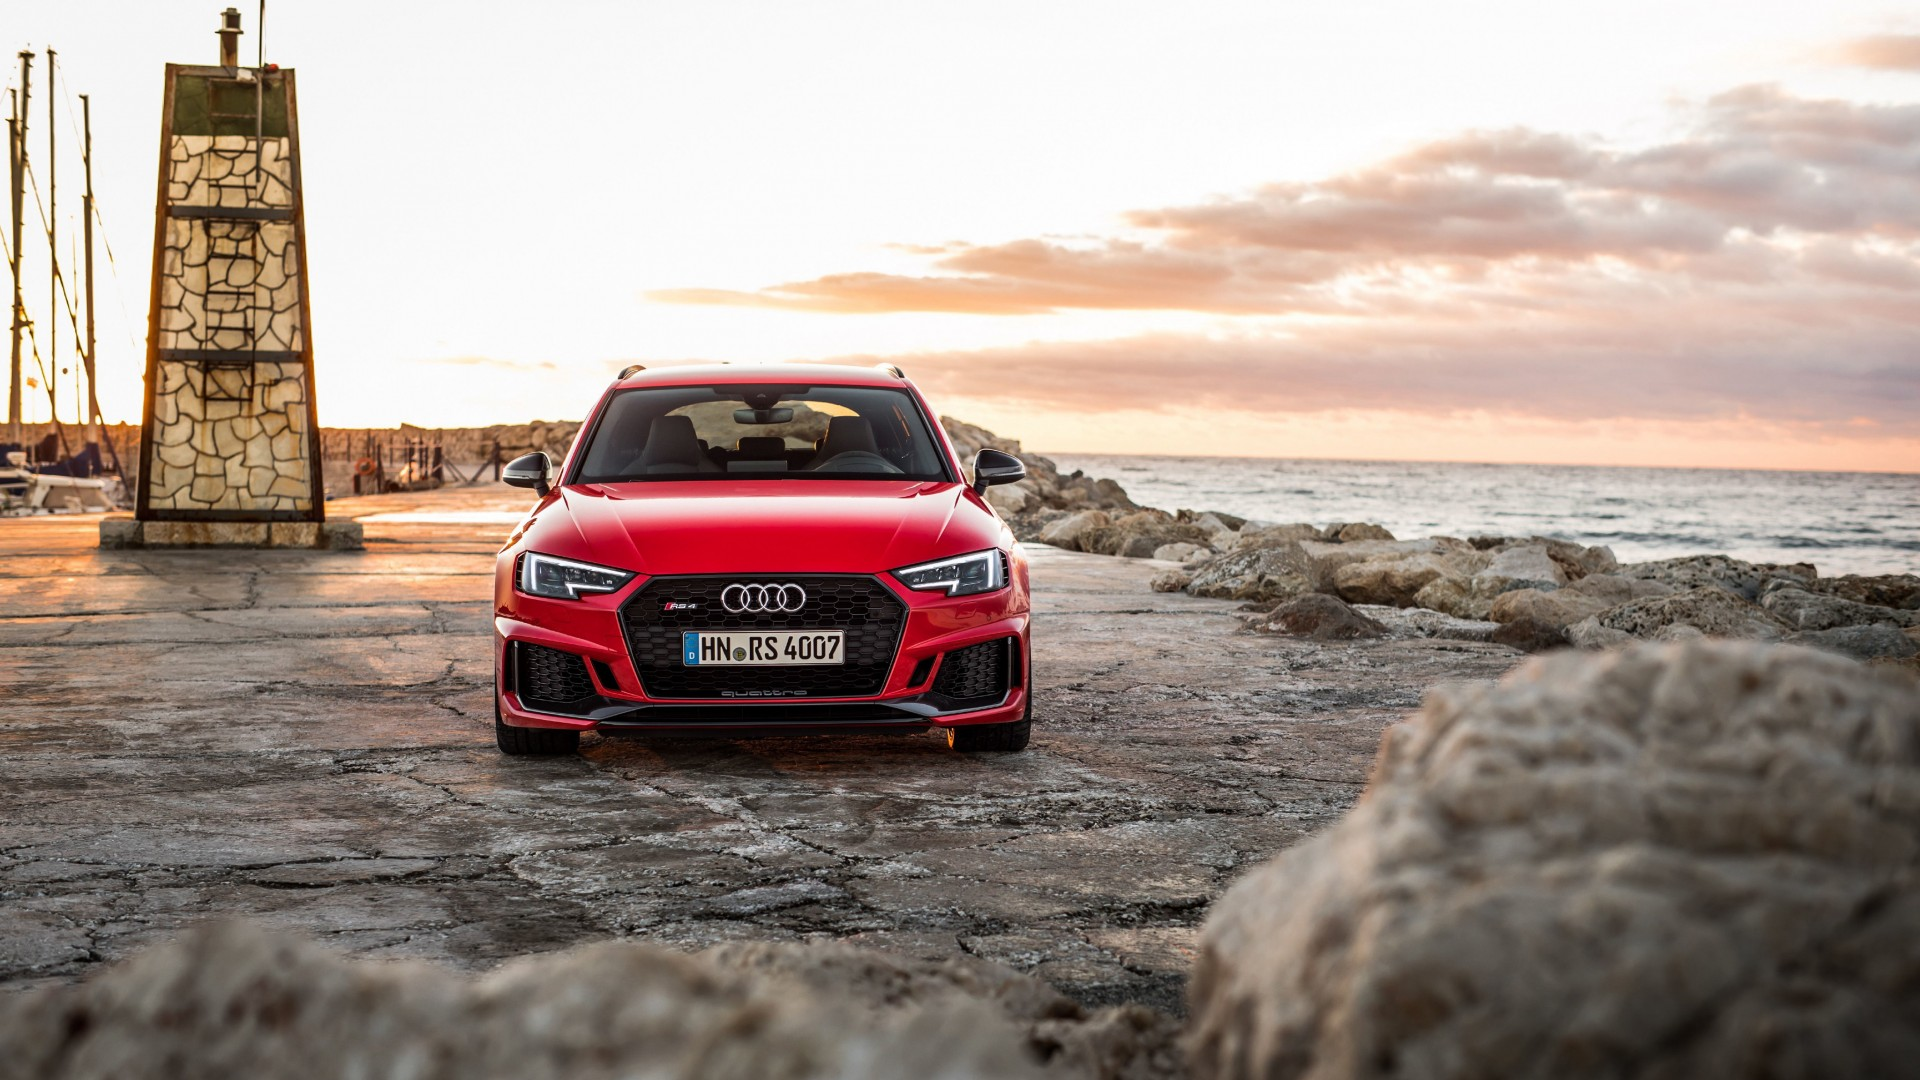 Audi RS4 Avant 4K 2018 Wallpaper | HD Car Wallpapers | ID #9248